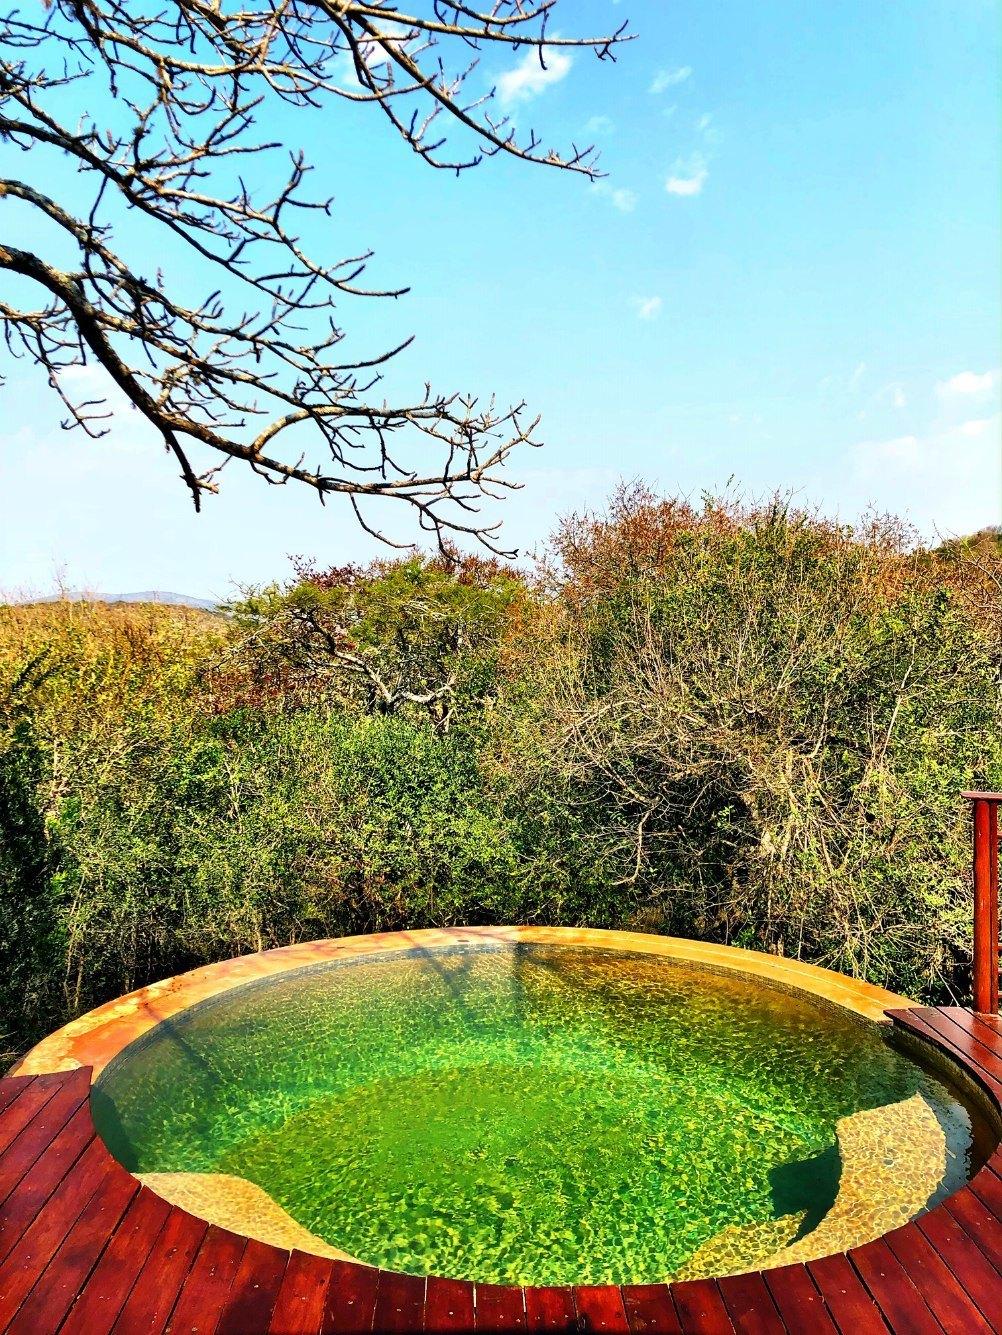 Pool in Thanda Game Reserve South Africa Photo Amanda O'Brien